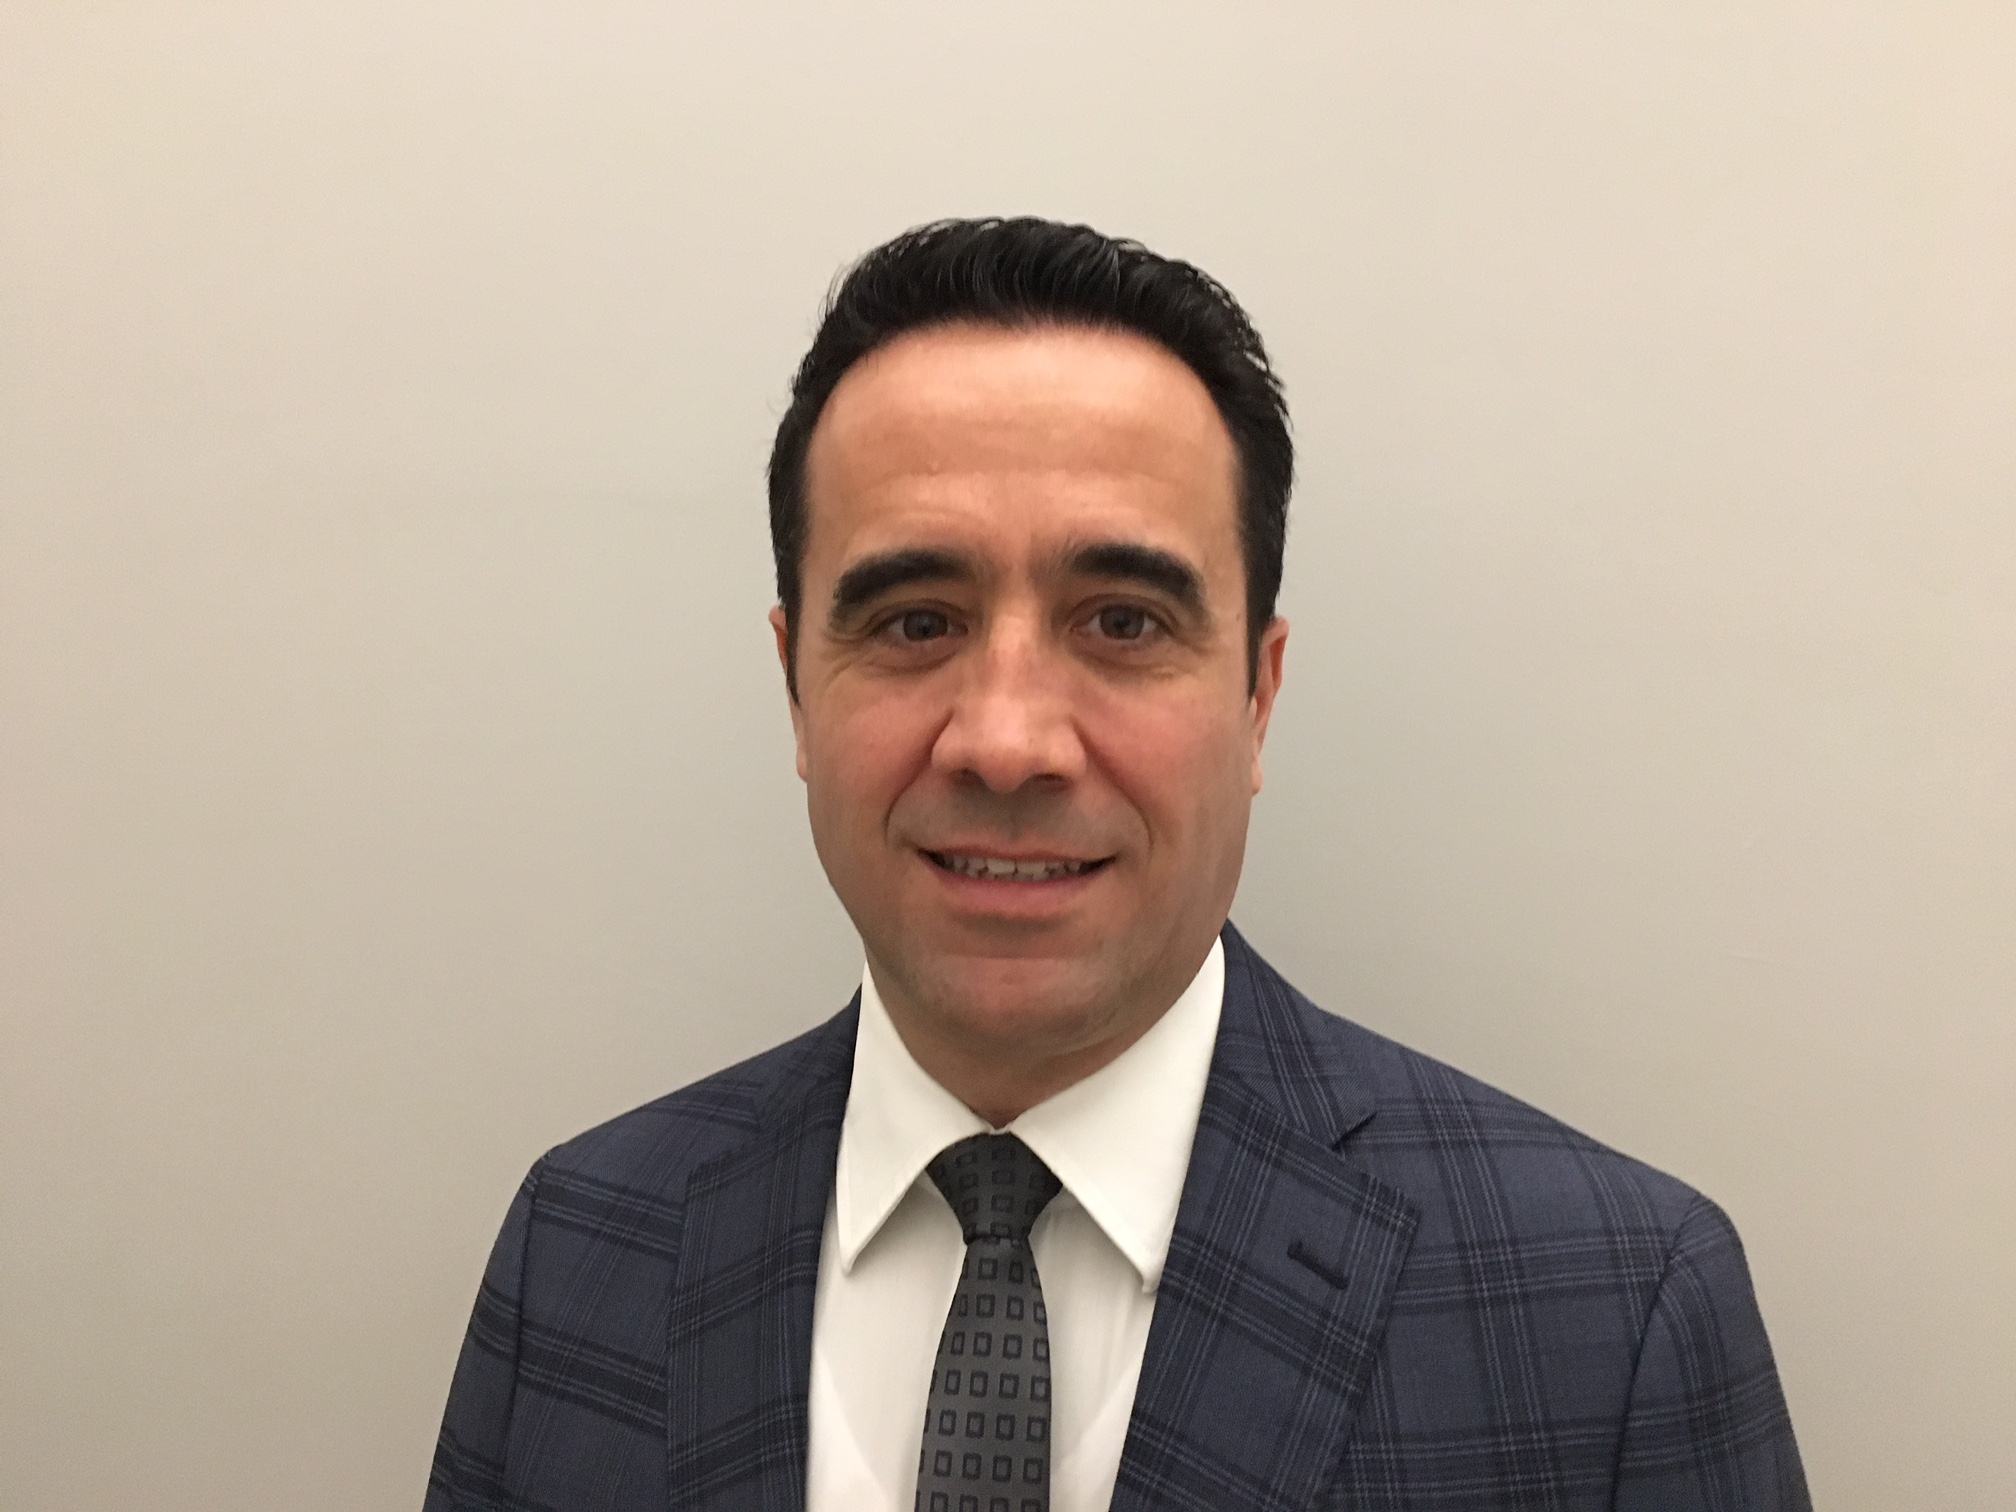 SERGIO GUIRRERI - Funding & Capital Markets Forum 2018